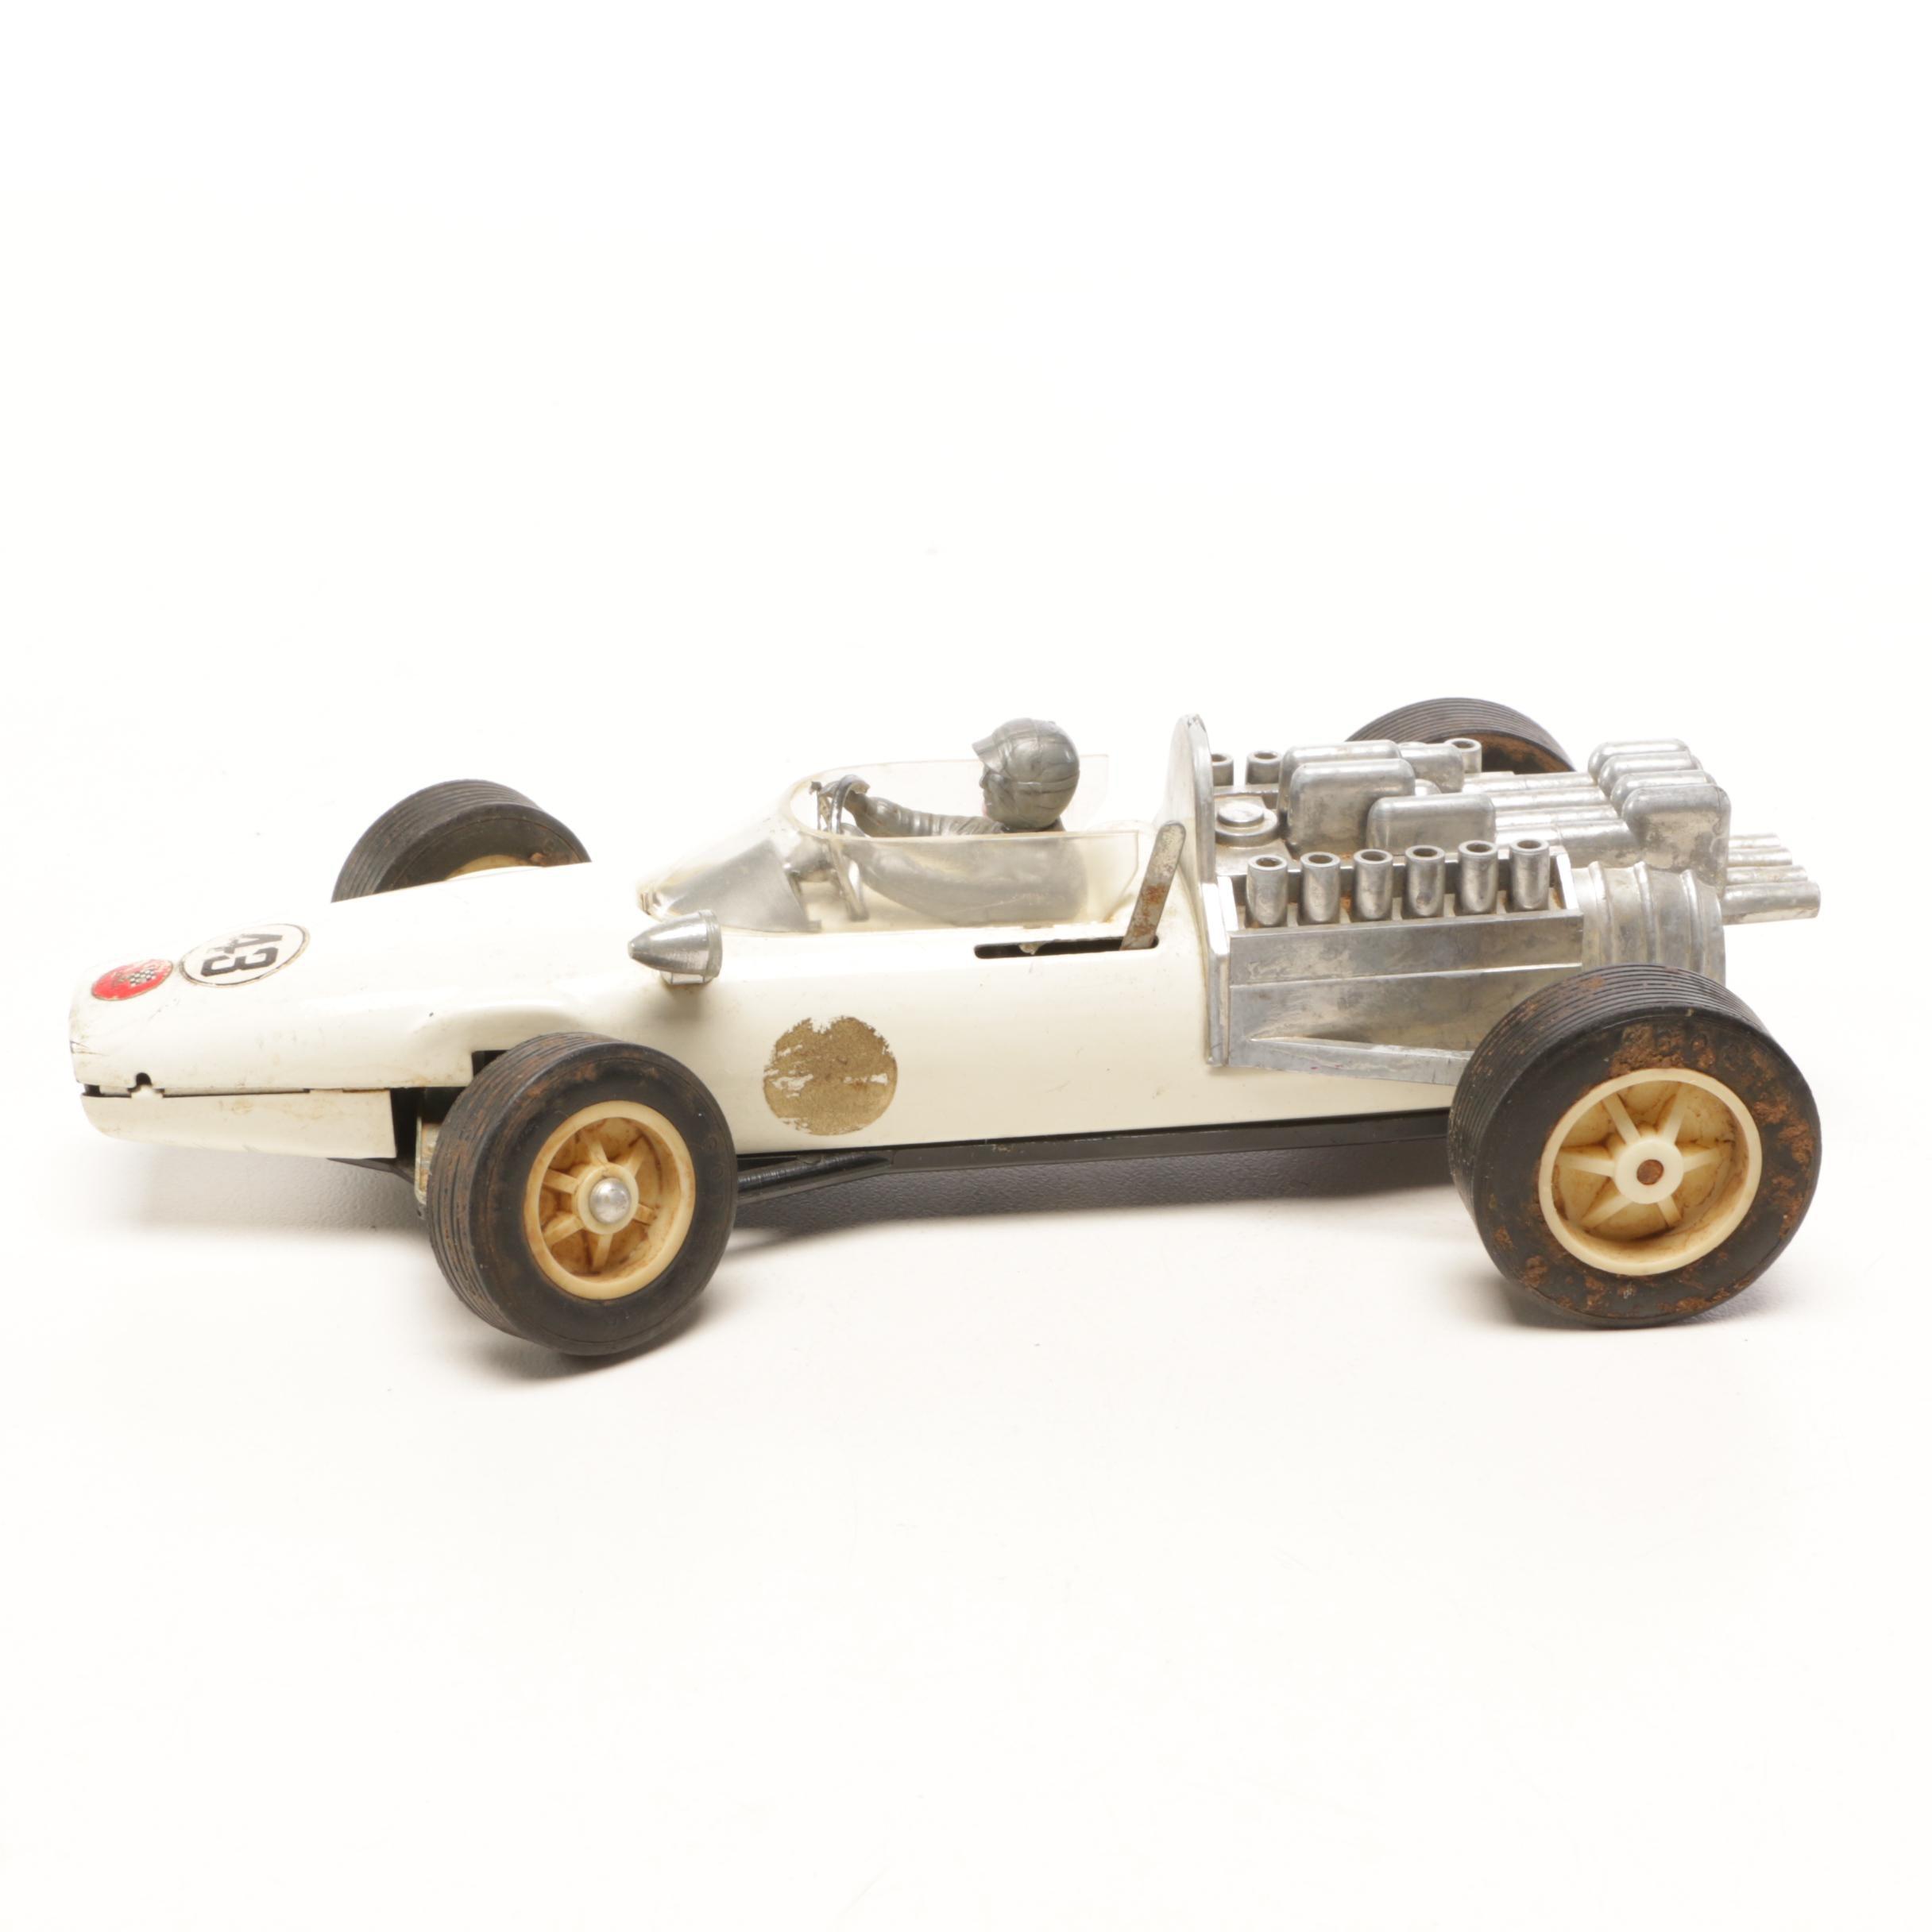 1970s Bandai Formula One Toy Racing Car